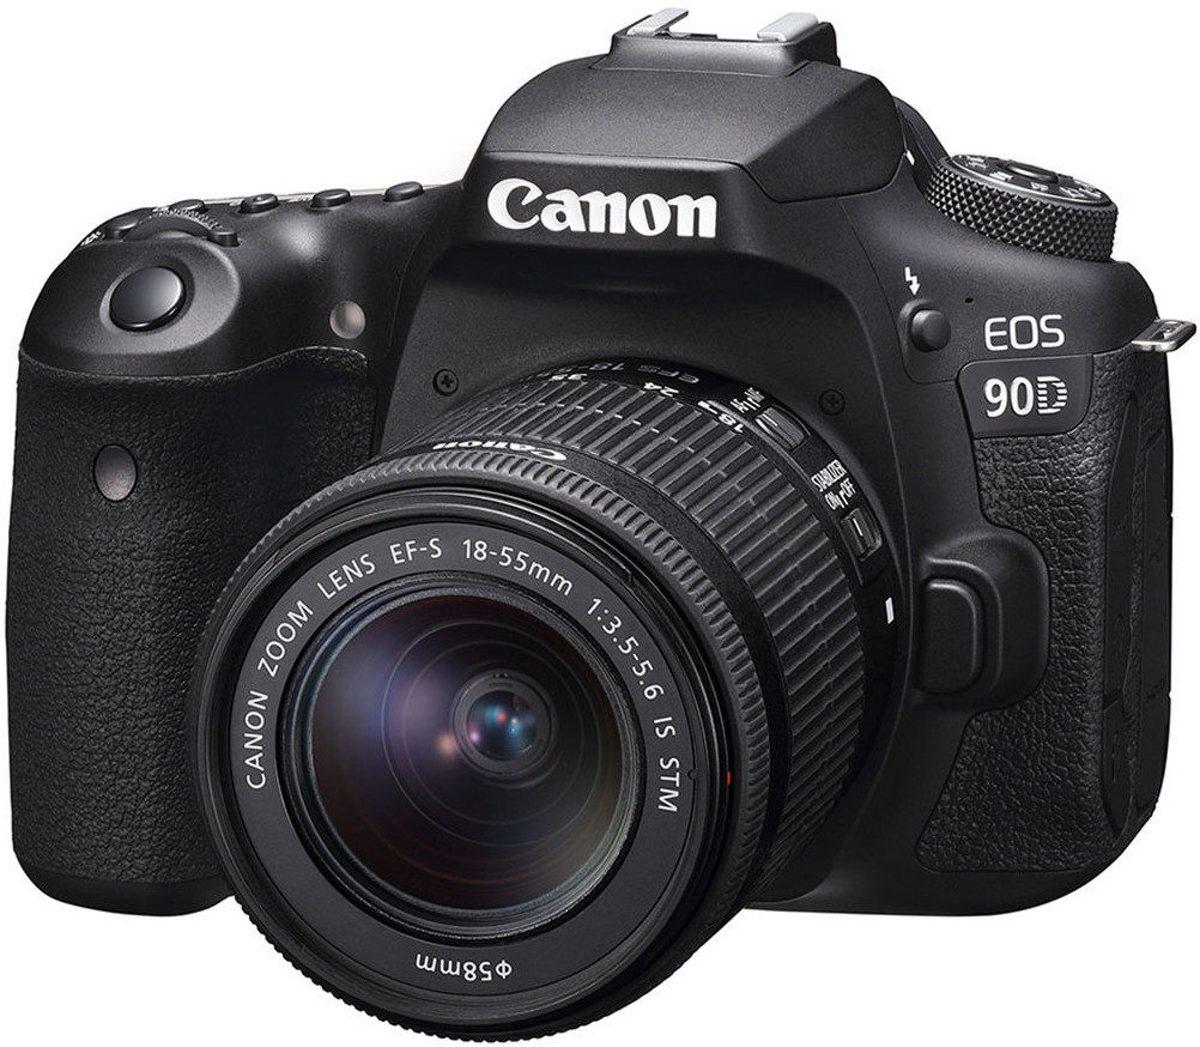 Canon EOS 90D + EF-S 18-55 IS STM - Zwart